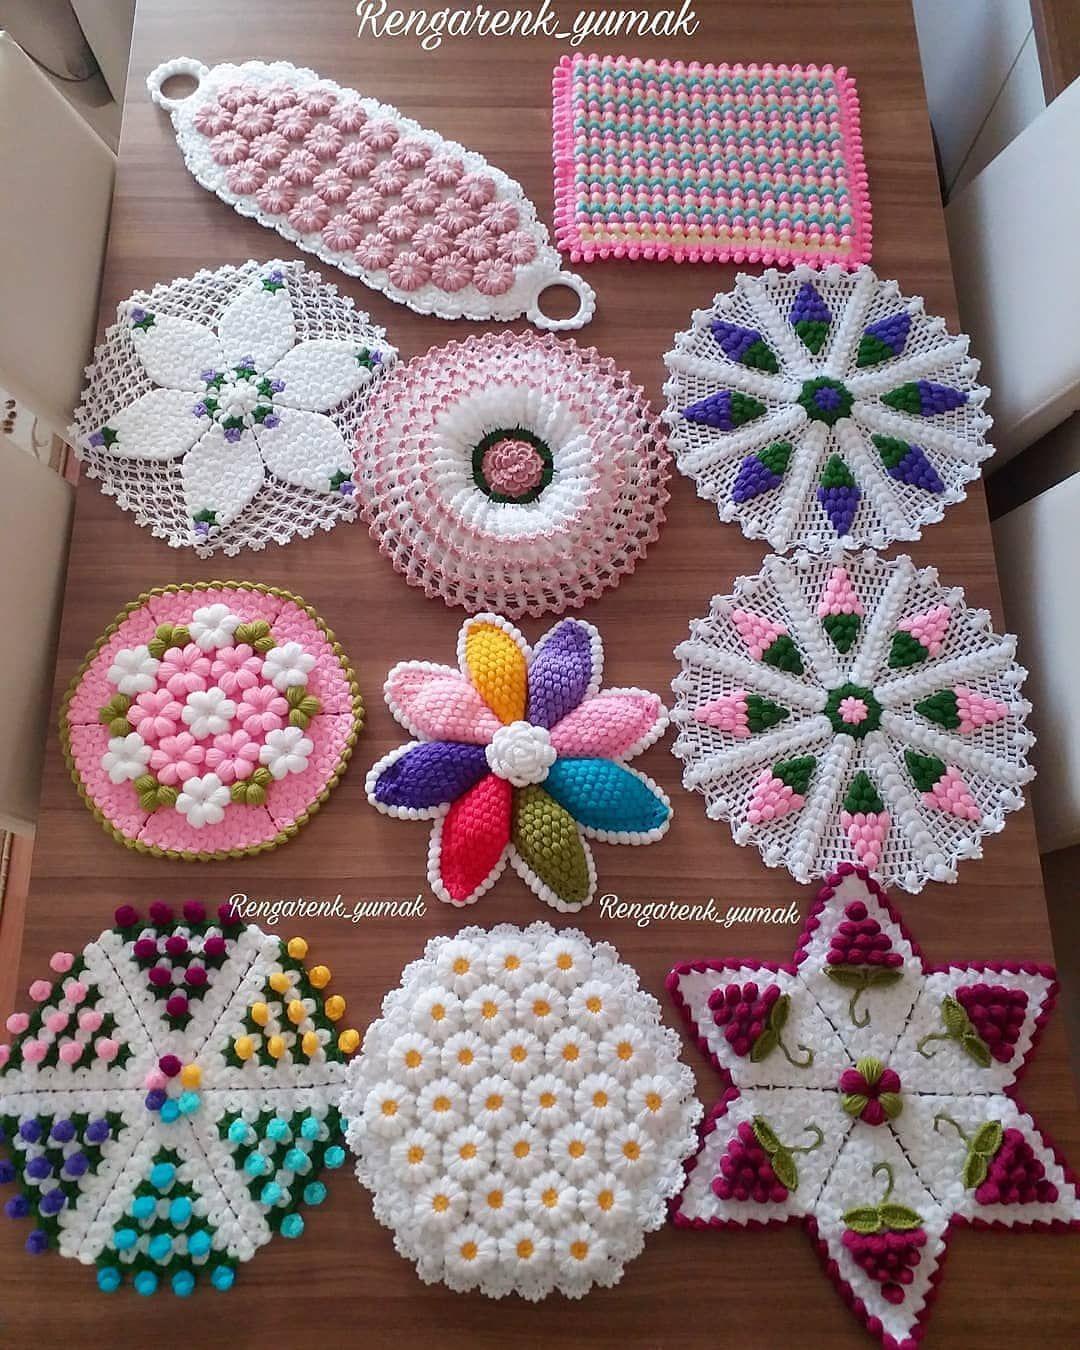 Amigurumi Treasures: 15 Crochet Projects to Cherish: Amazon.co.uk ... | 1350x1080